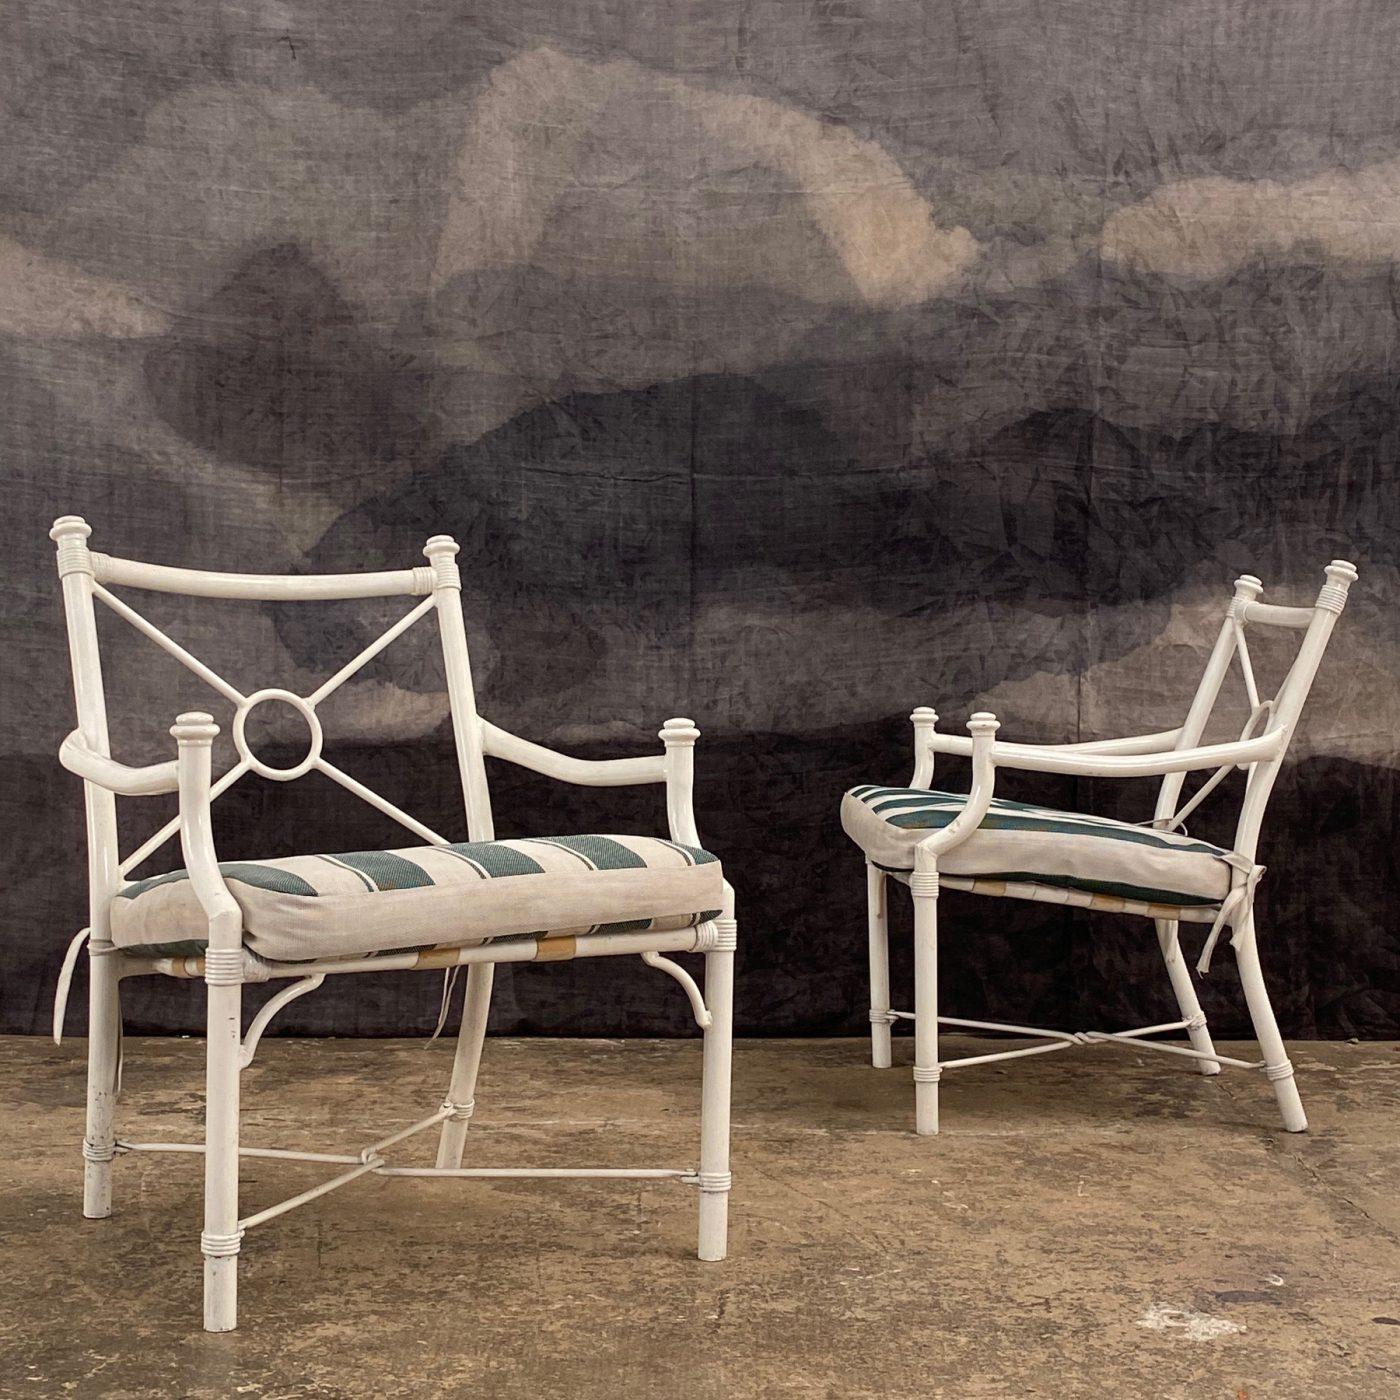 metal-garden-chairs0000